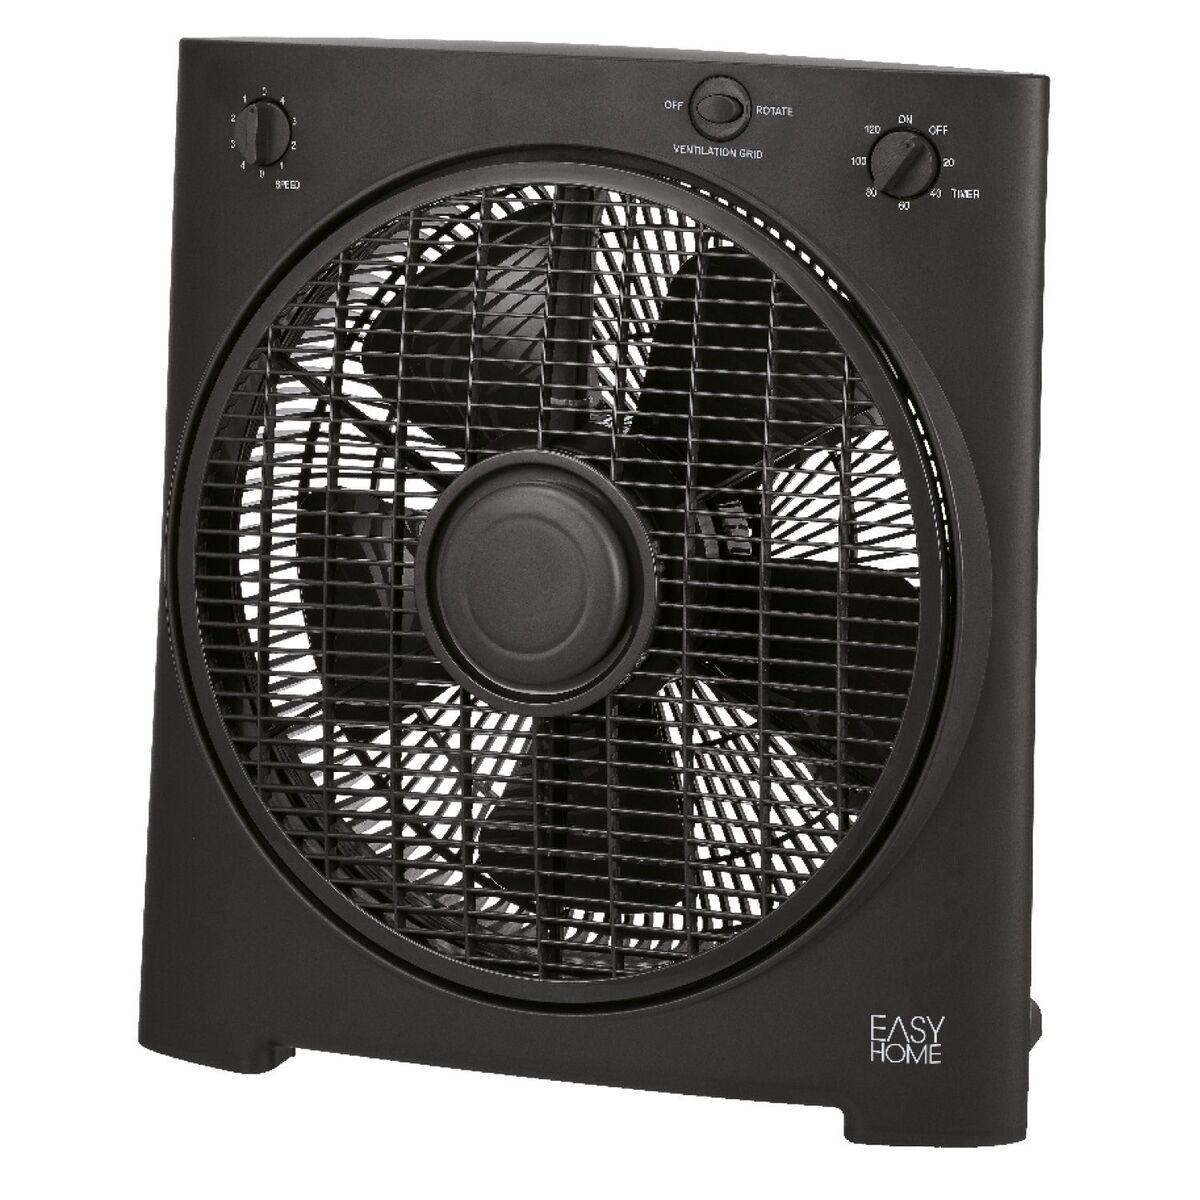 Bild 4 von EASY HOME®  Box-Ventilator